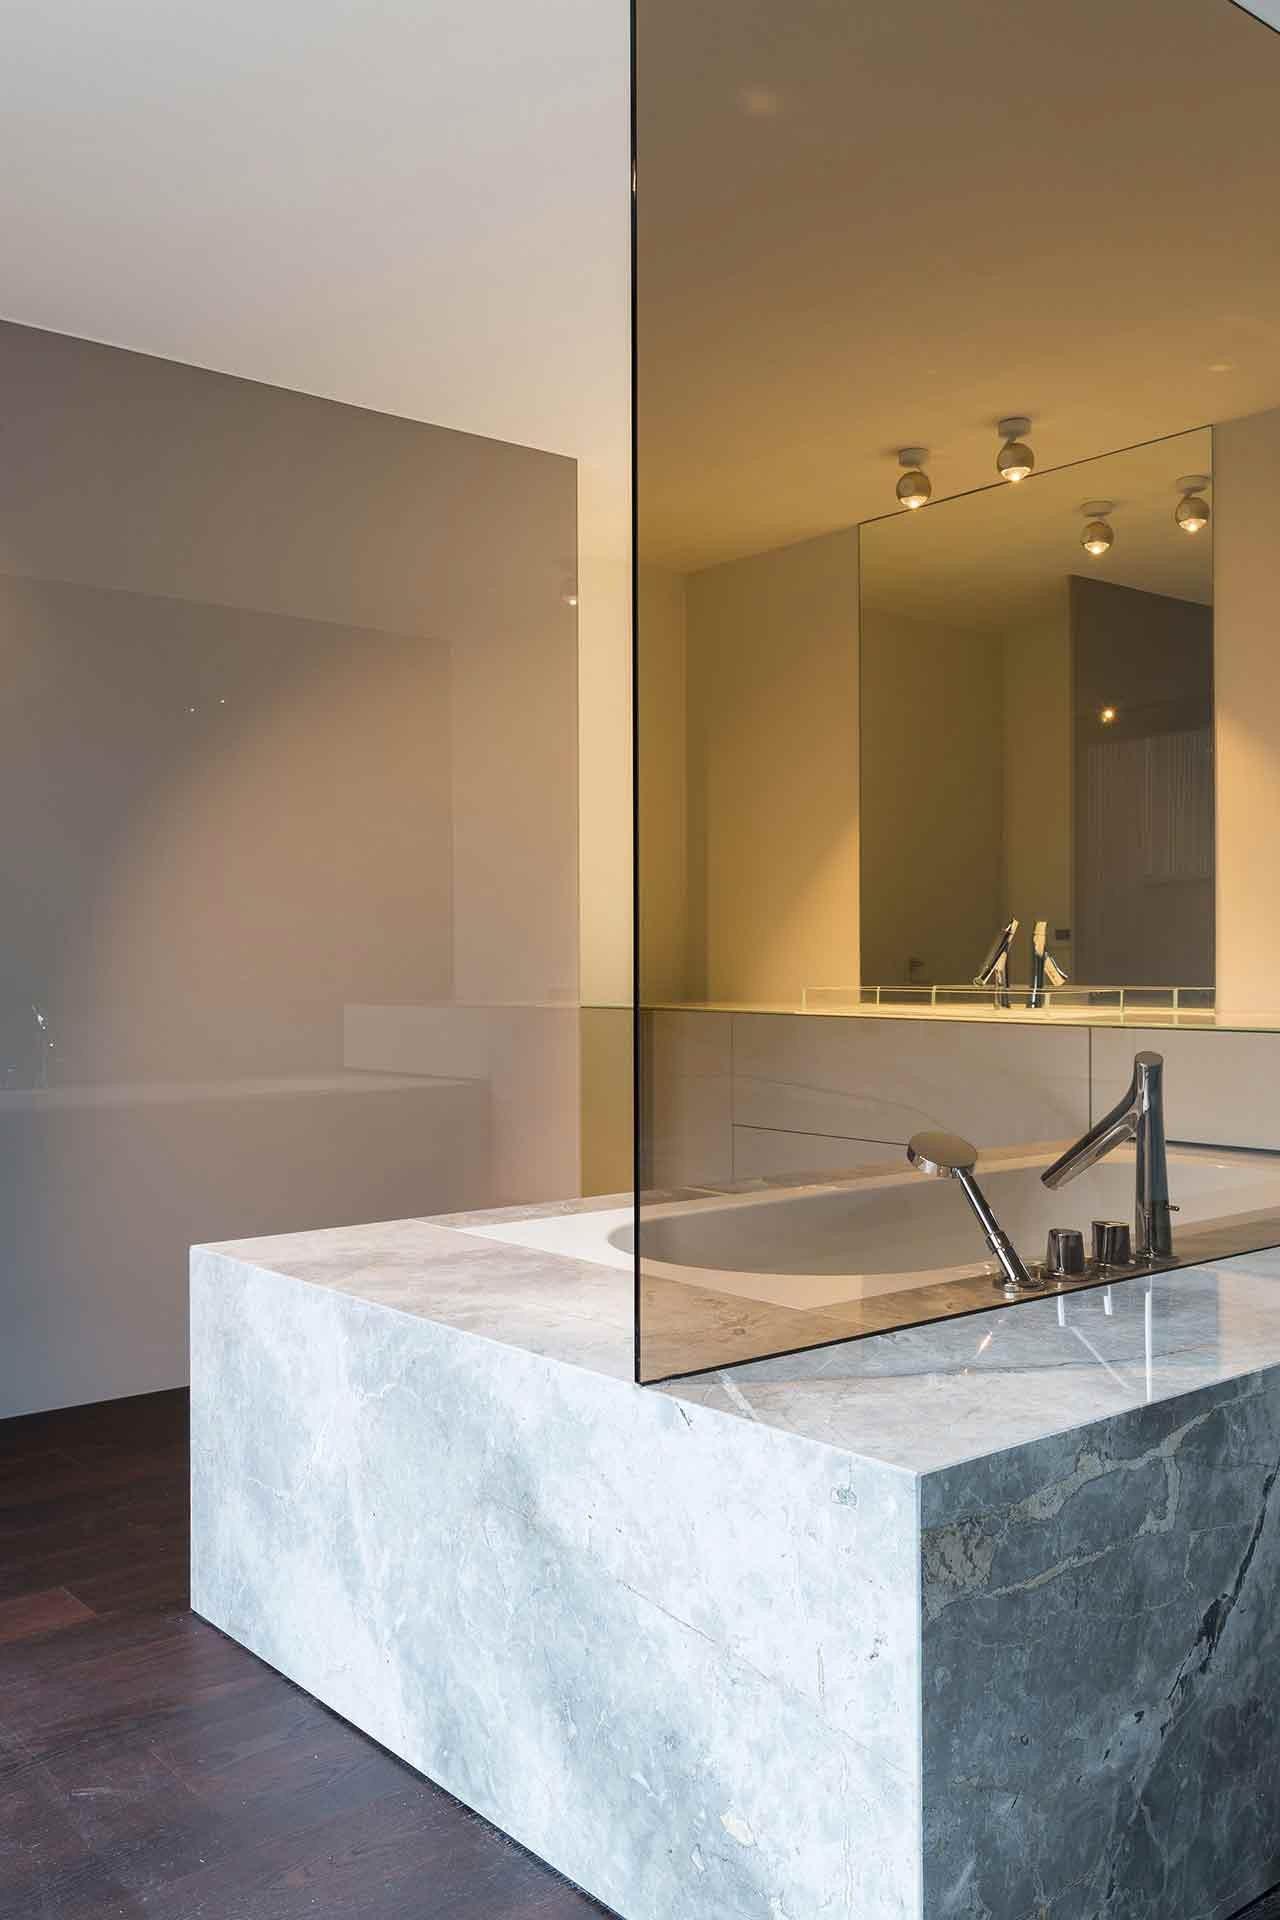 Totaalinrichting-badkamer-modern-SintMartenLatem-3.jpg